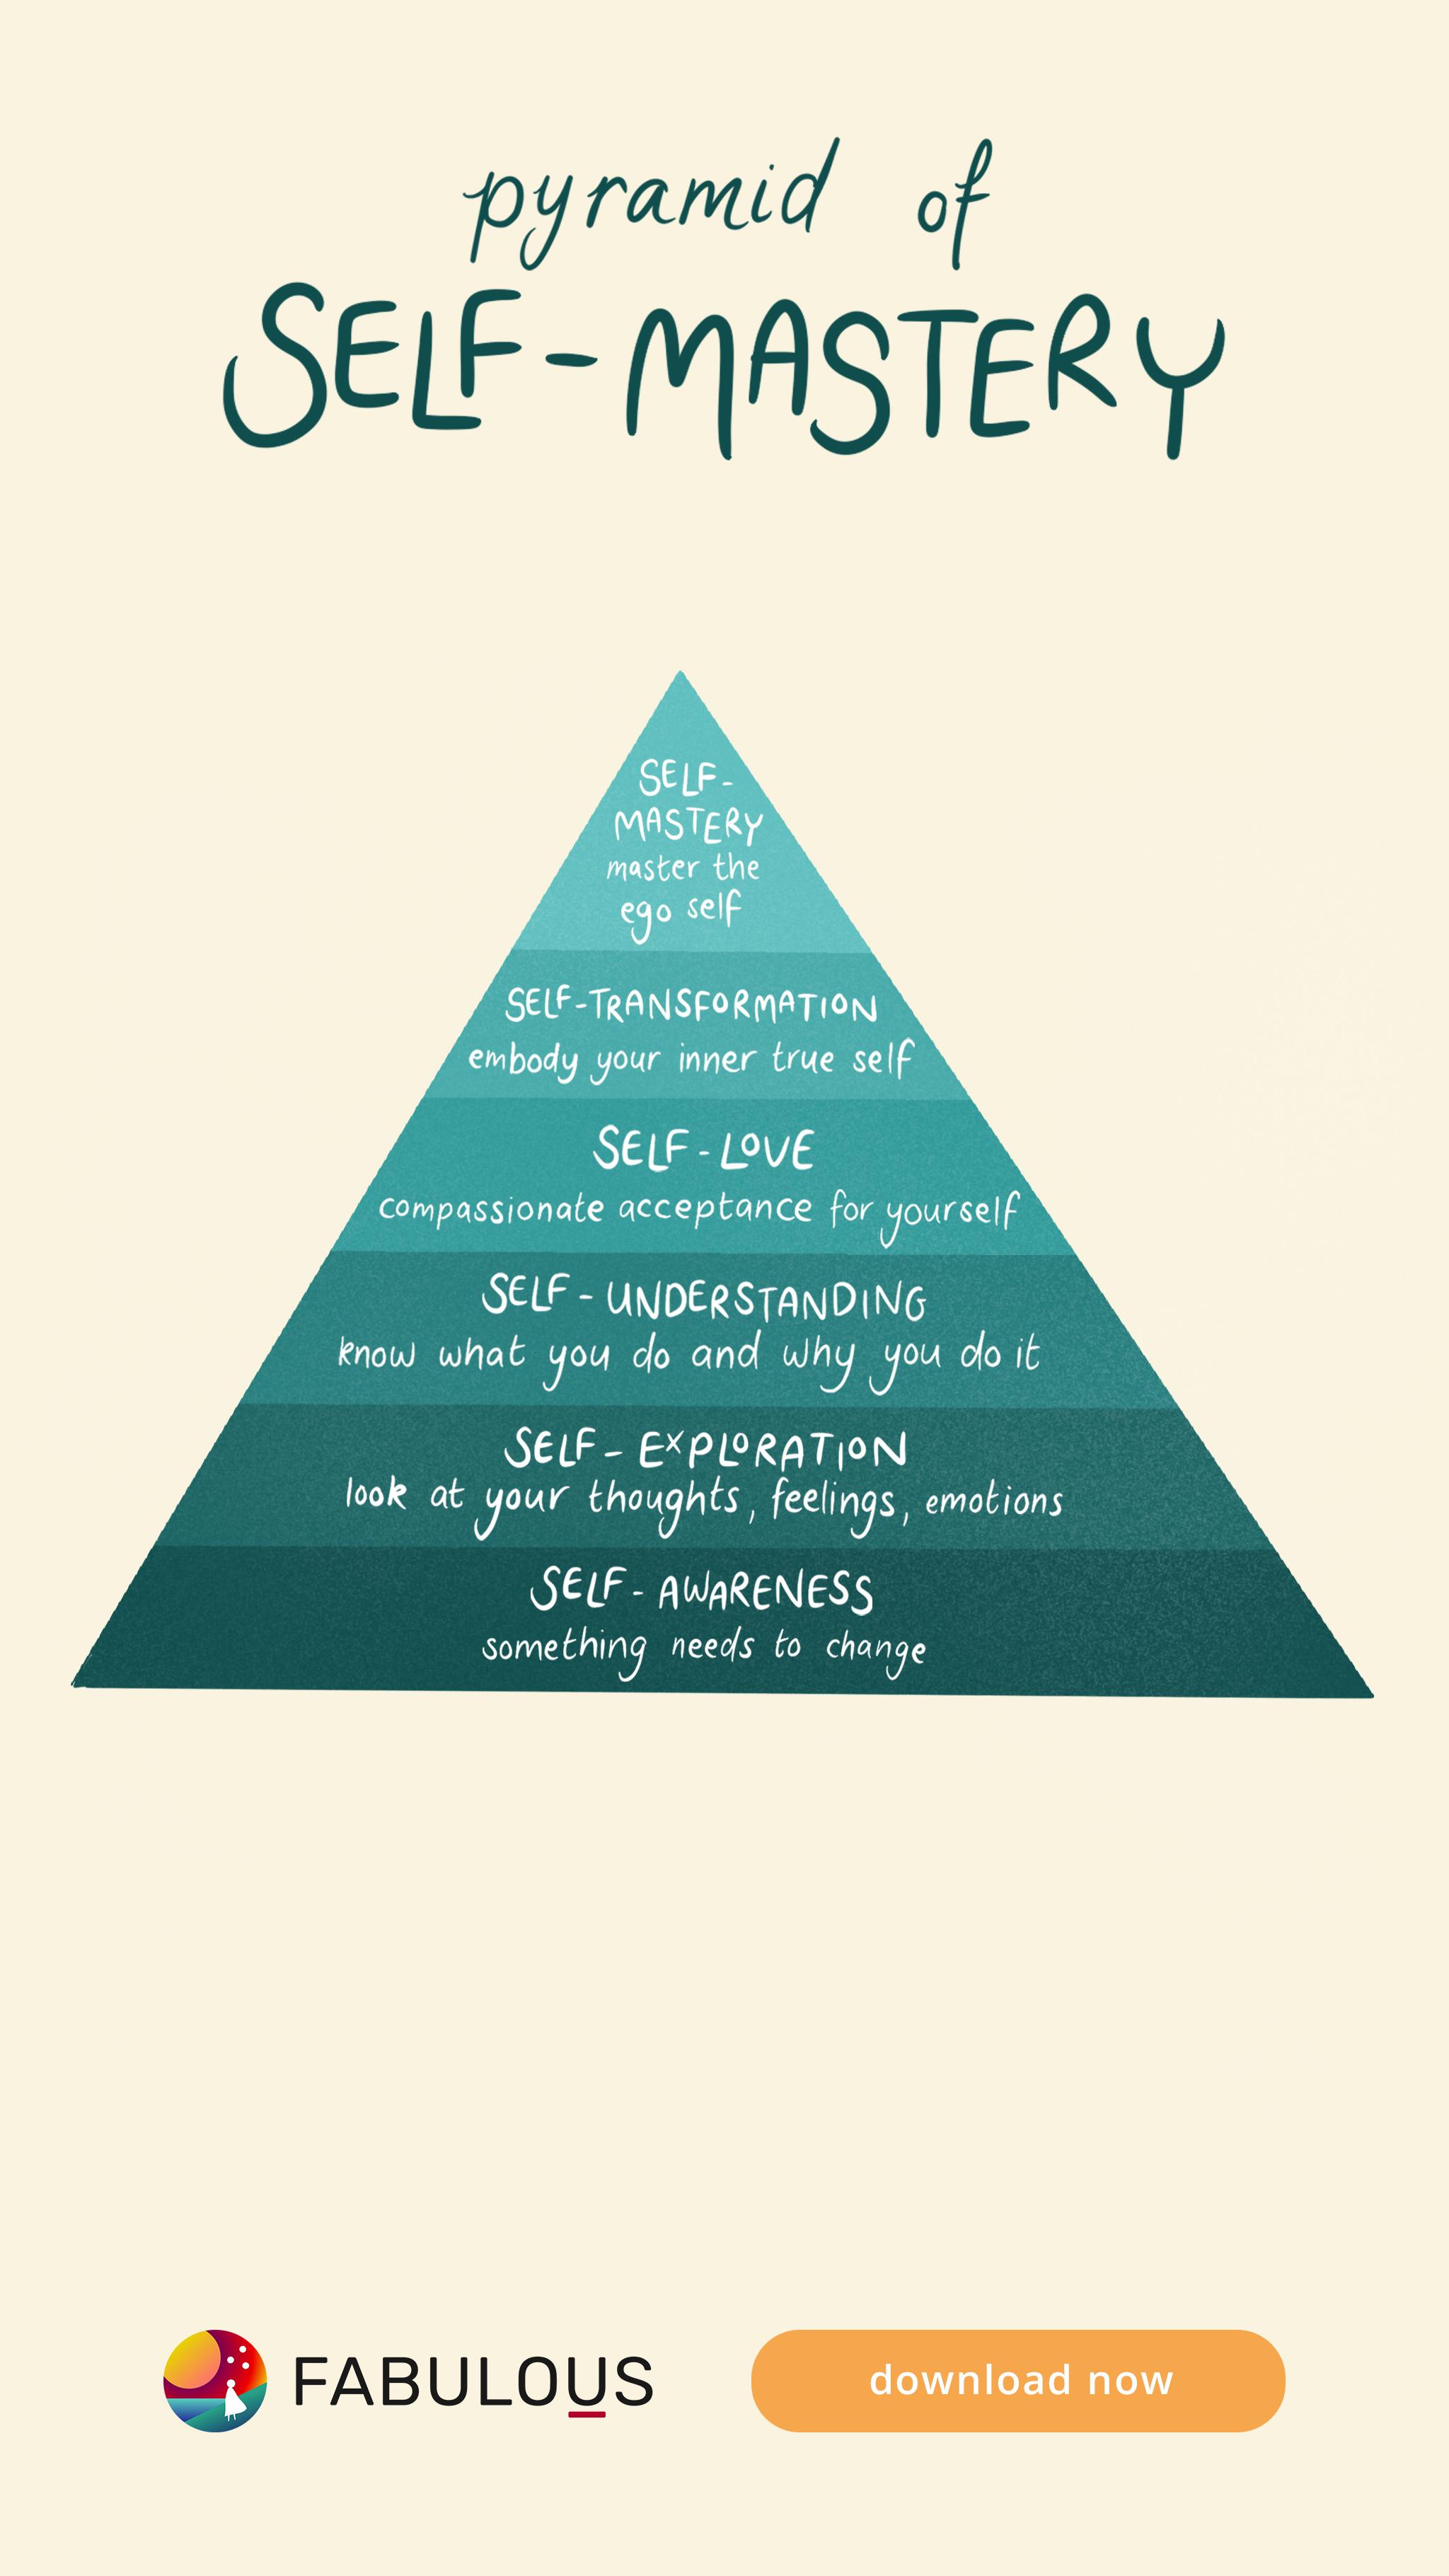 Pyramid of Self-Mastery